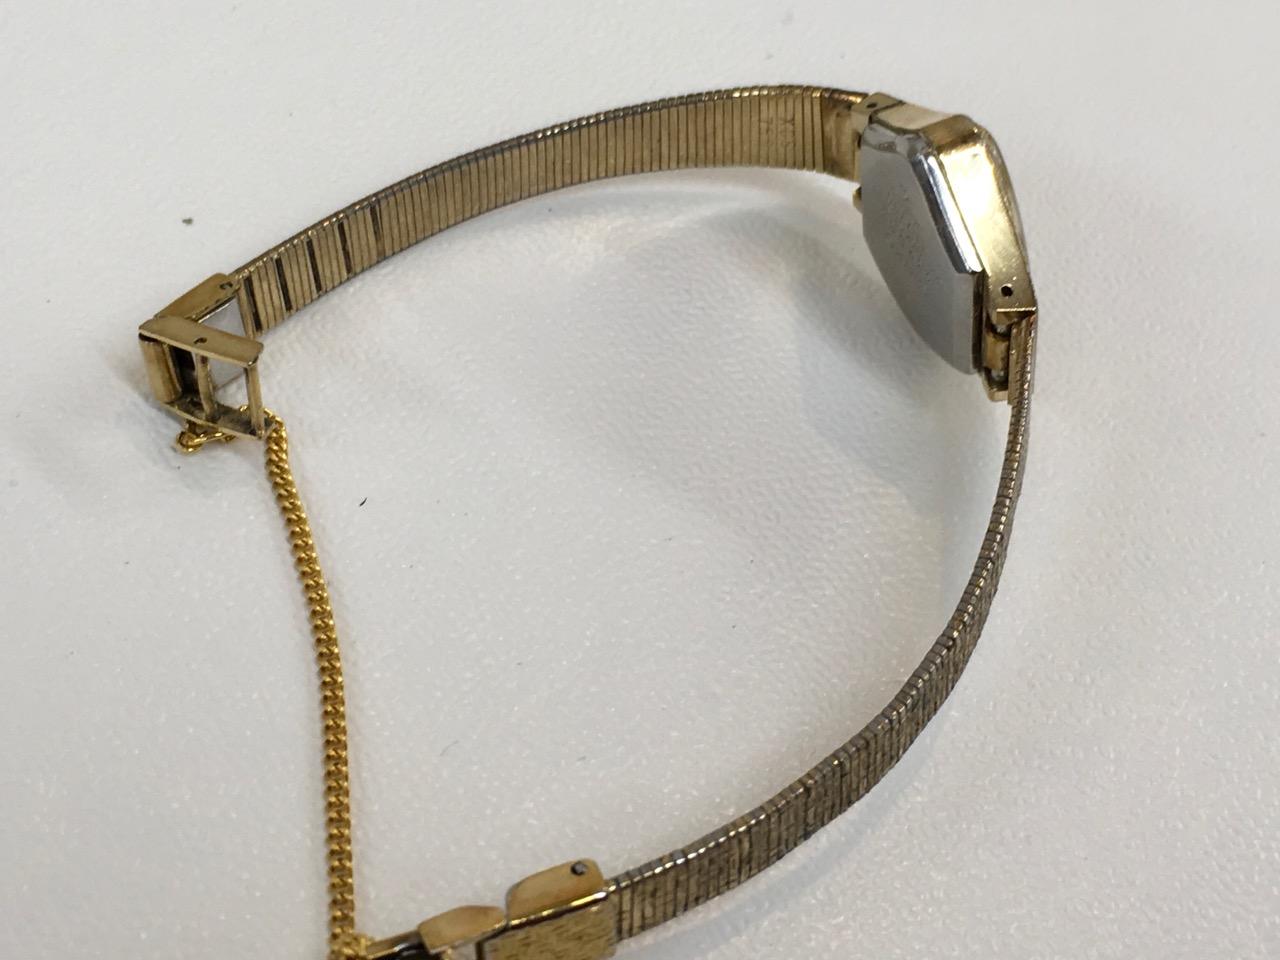 SEIKO セイコー 手巻き腕時計 腕時計 分解掃除 オーバーホール